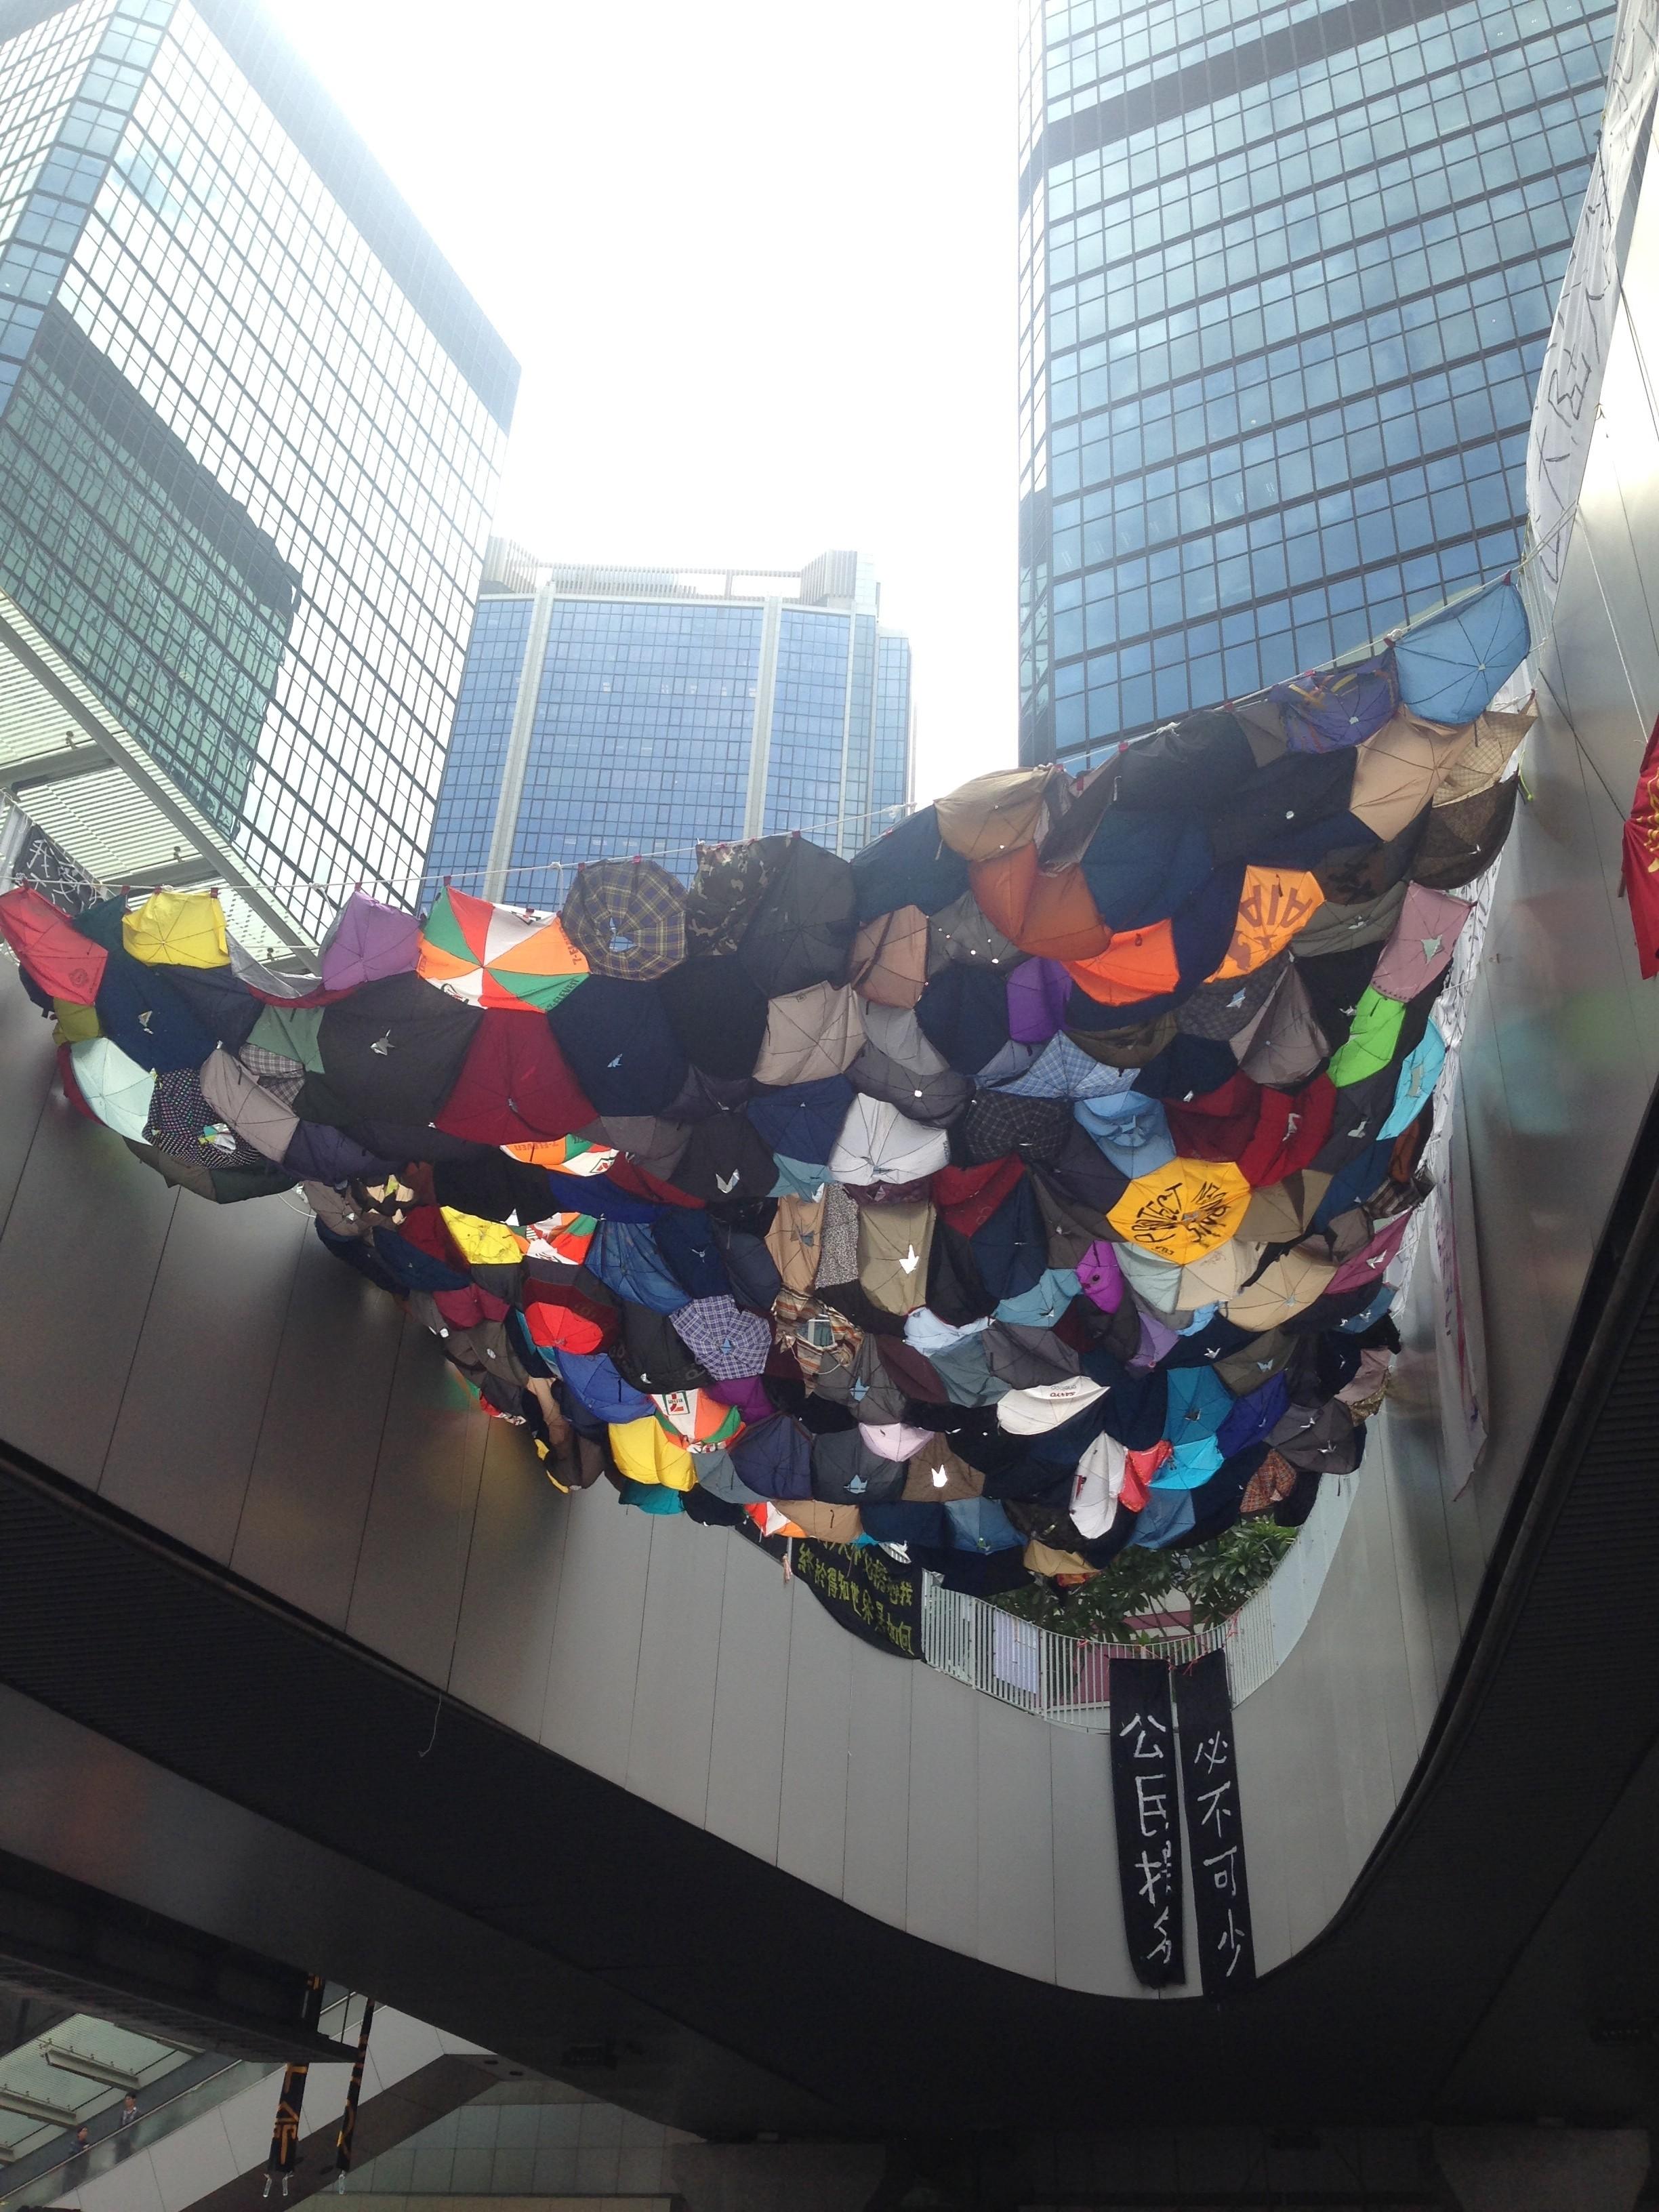 telhado guarda-chuva